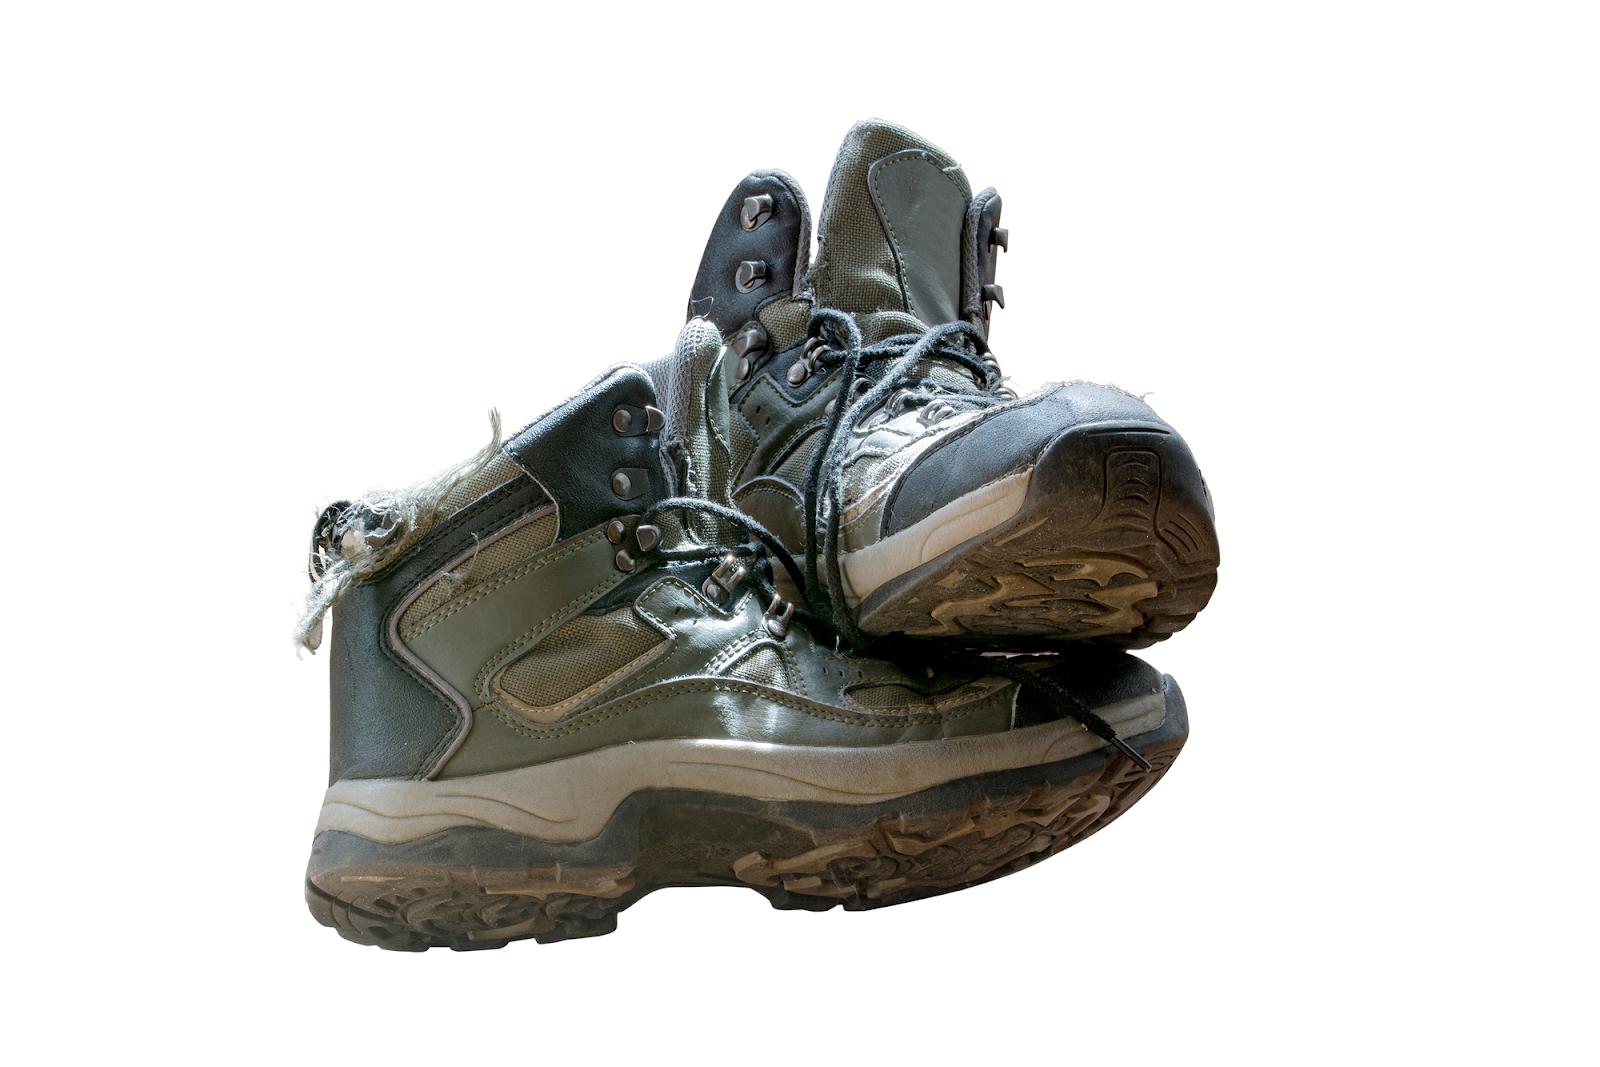 Half-hoog tot hoge wandelschoenen, categorie A/B, B